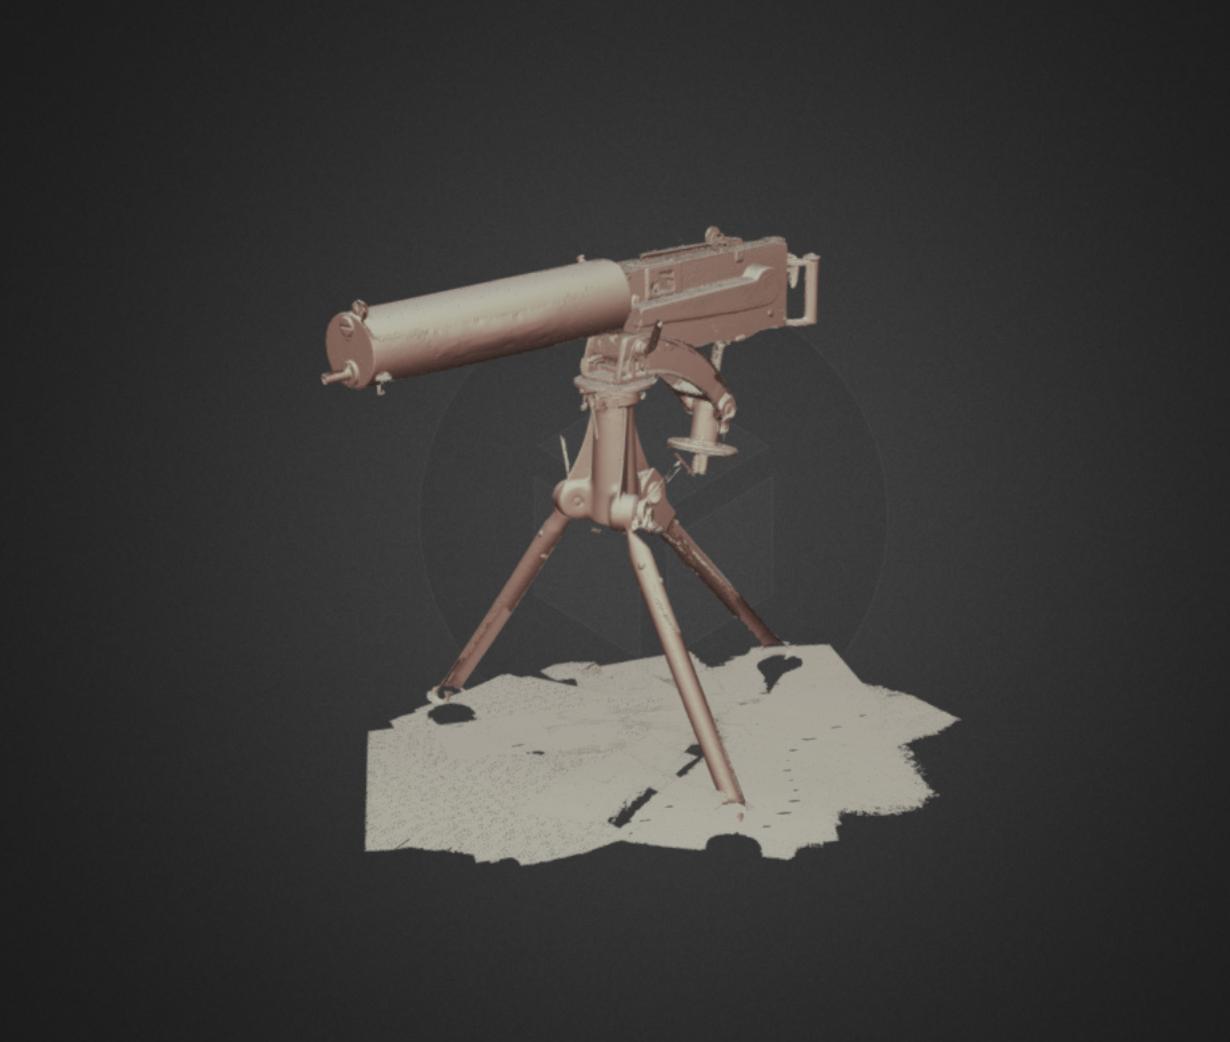 Capture d'écran 2017-12-14 à 15.06.07.png Download free STL file Vickers MK 1 heavy machine gun, ca. 1900 • 3D printer object, AucklandMuseum